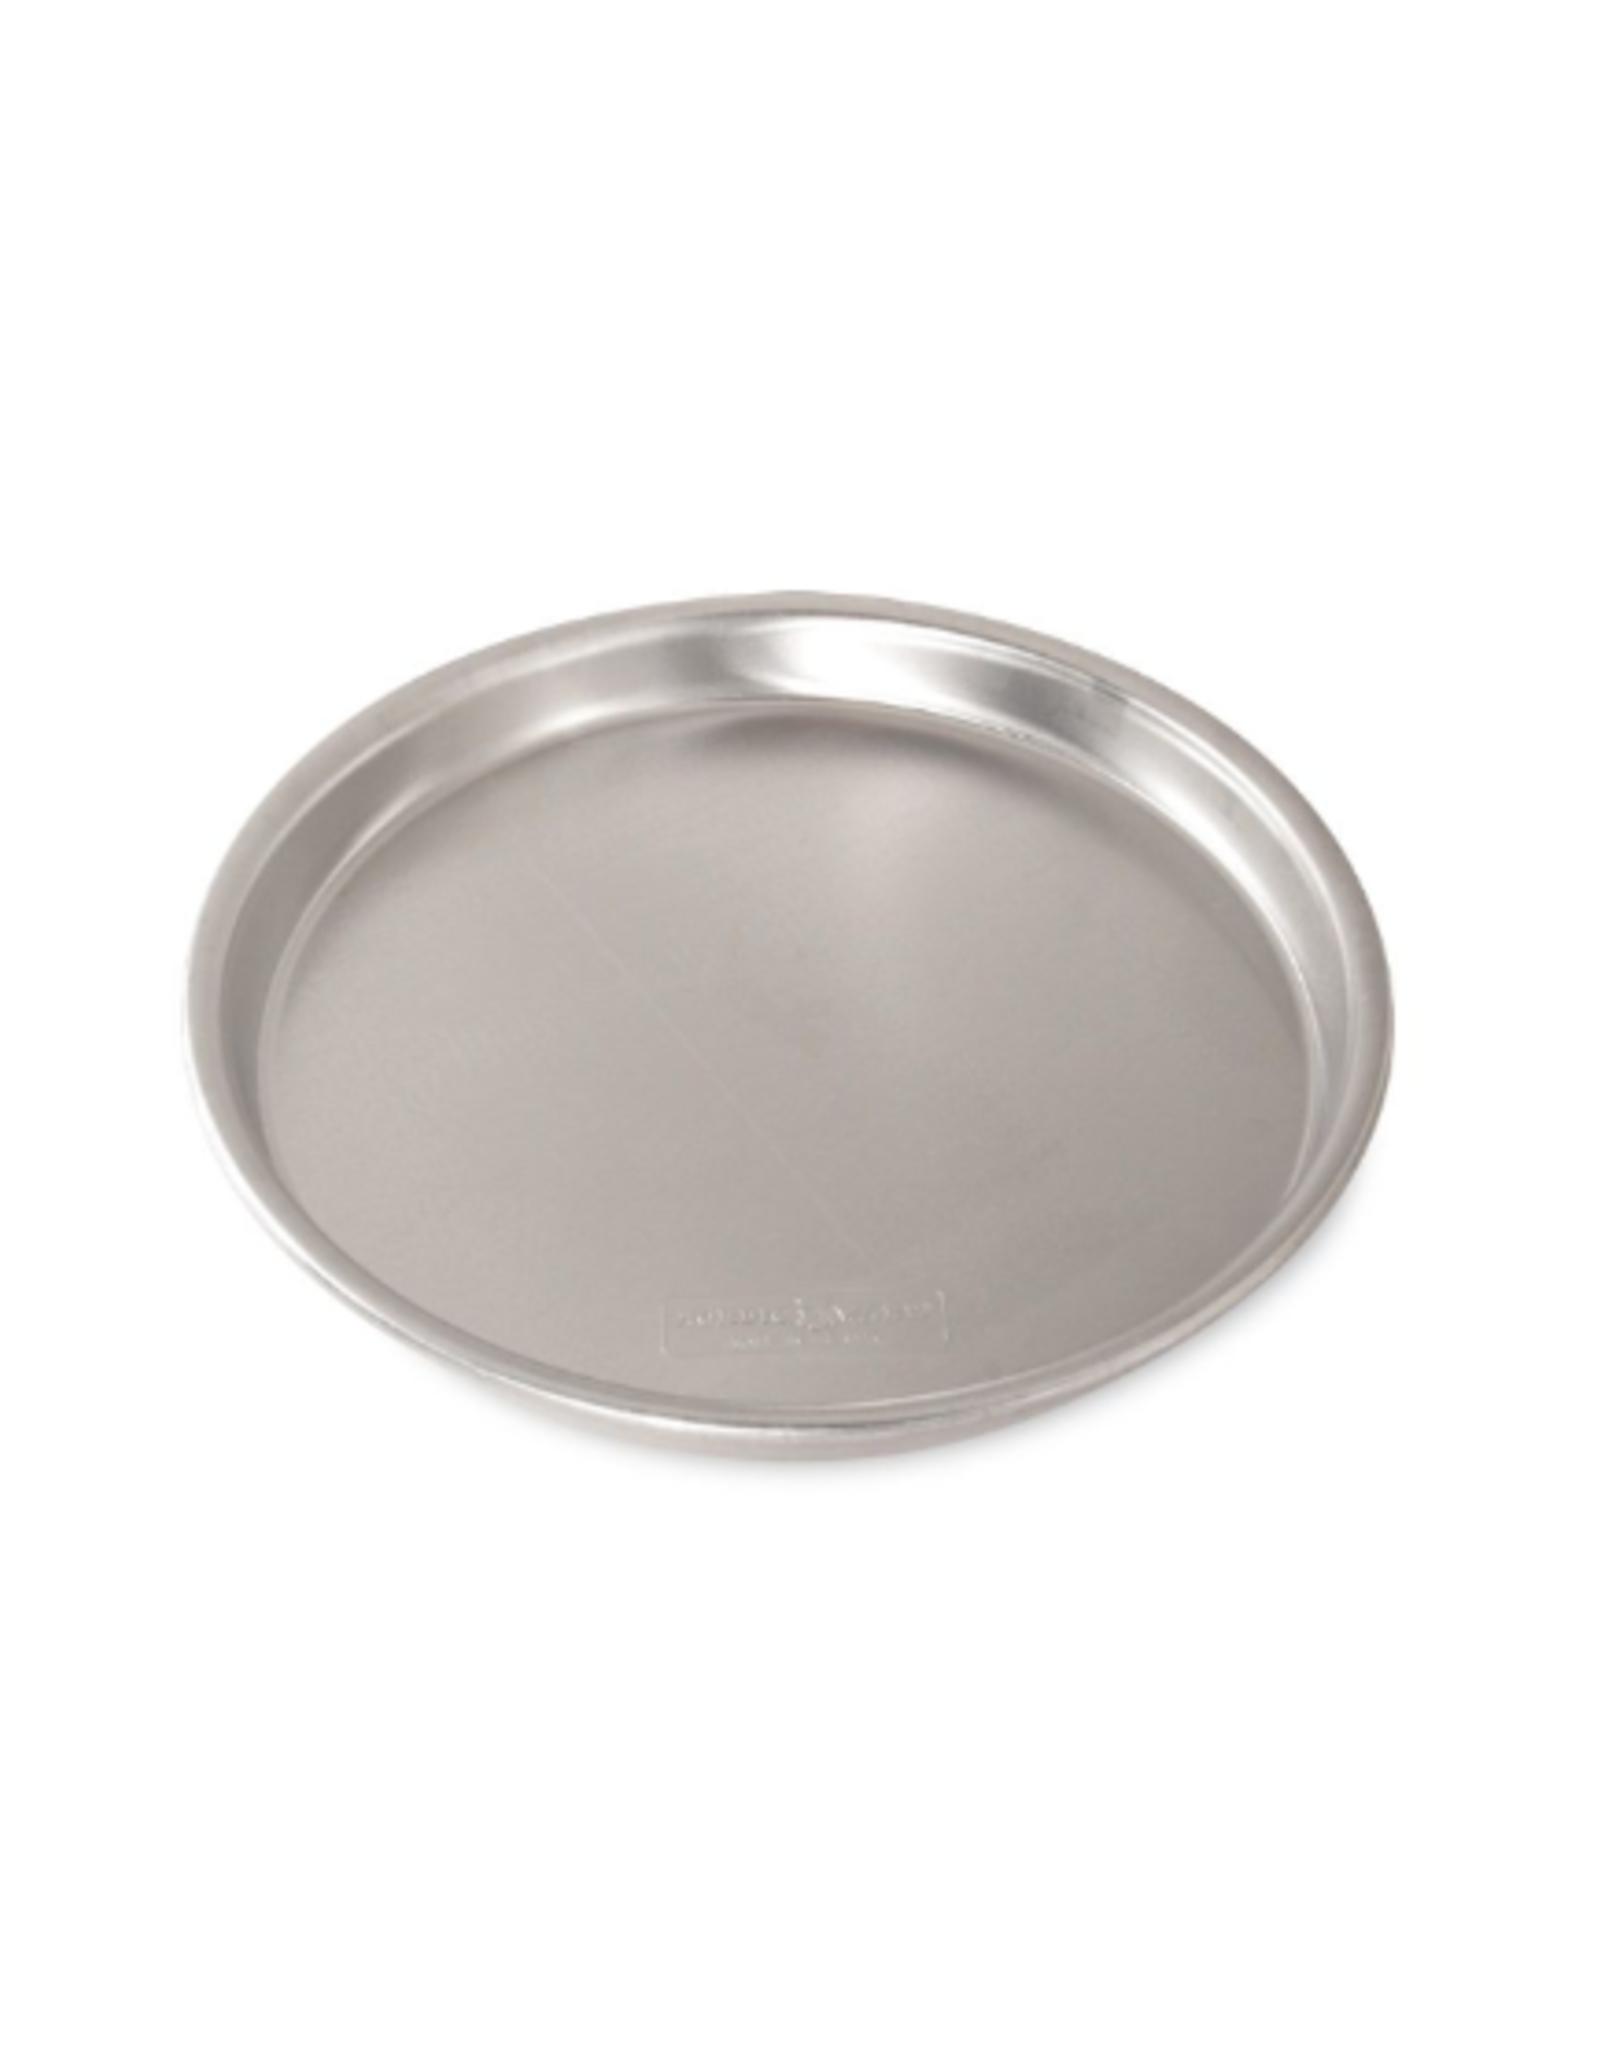 "Nordicware 14"" Deep Dish Pizza Pan"